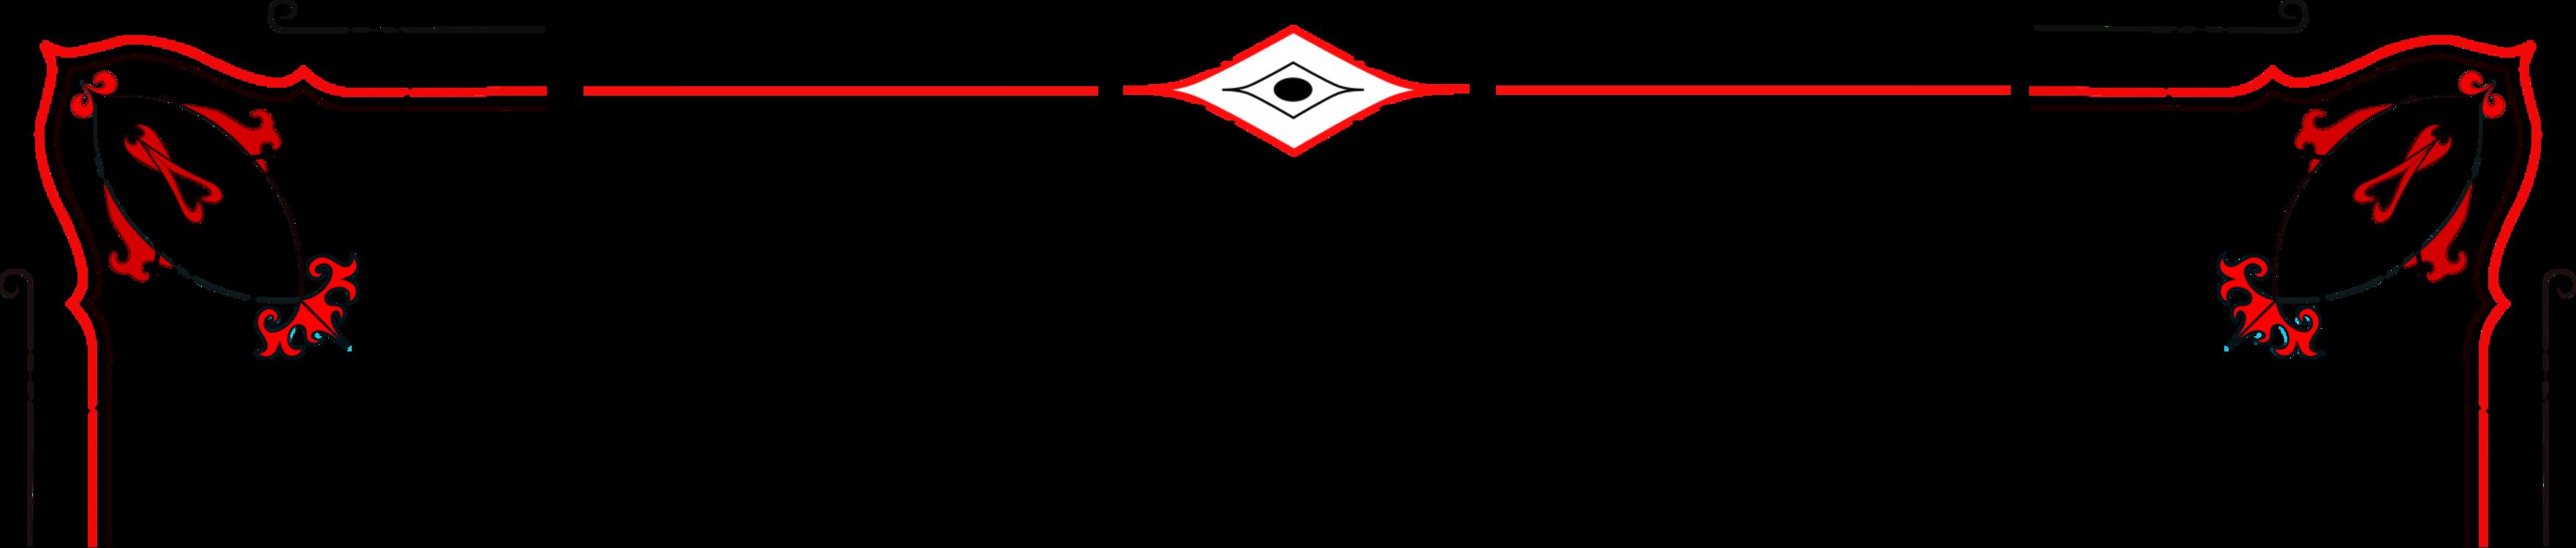 Line Art,Angle,Symmetry